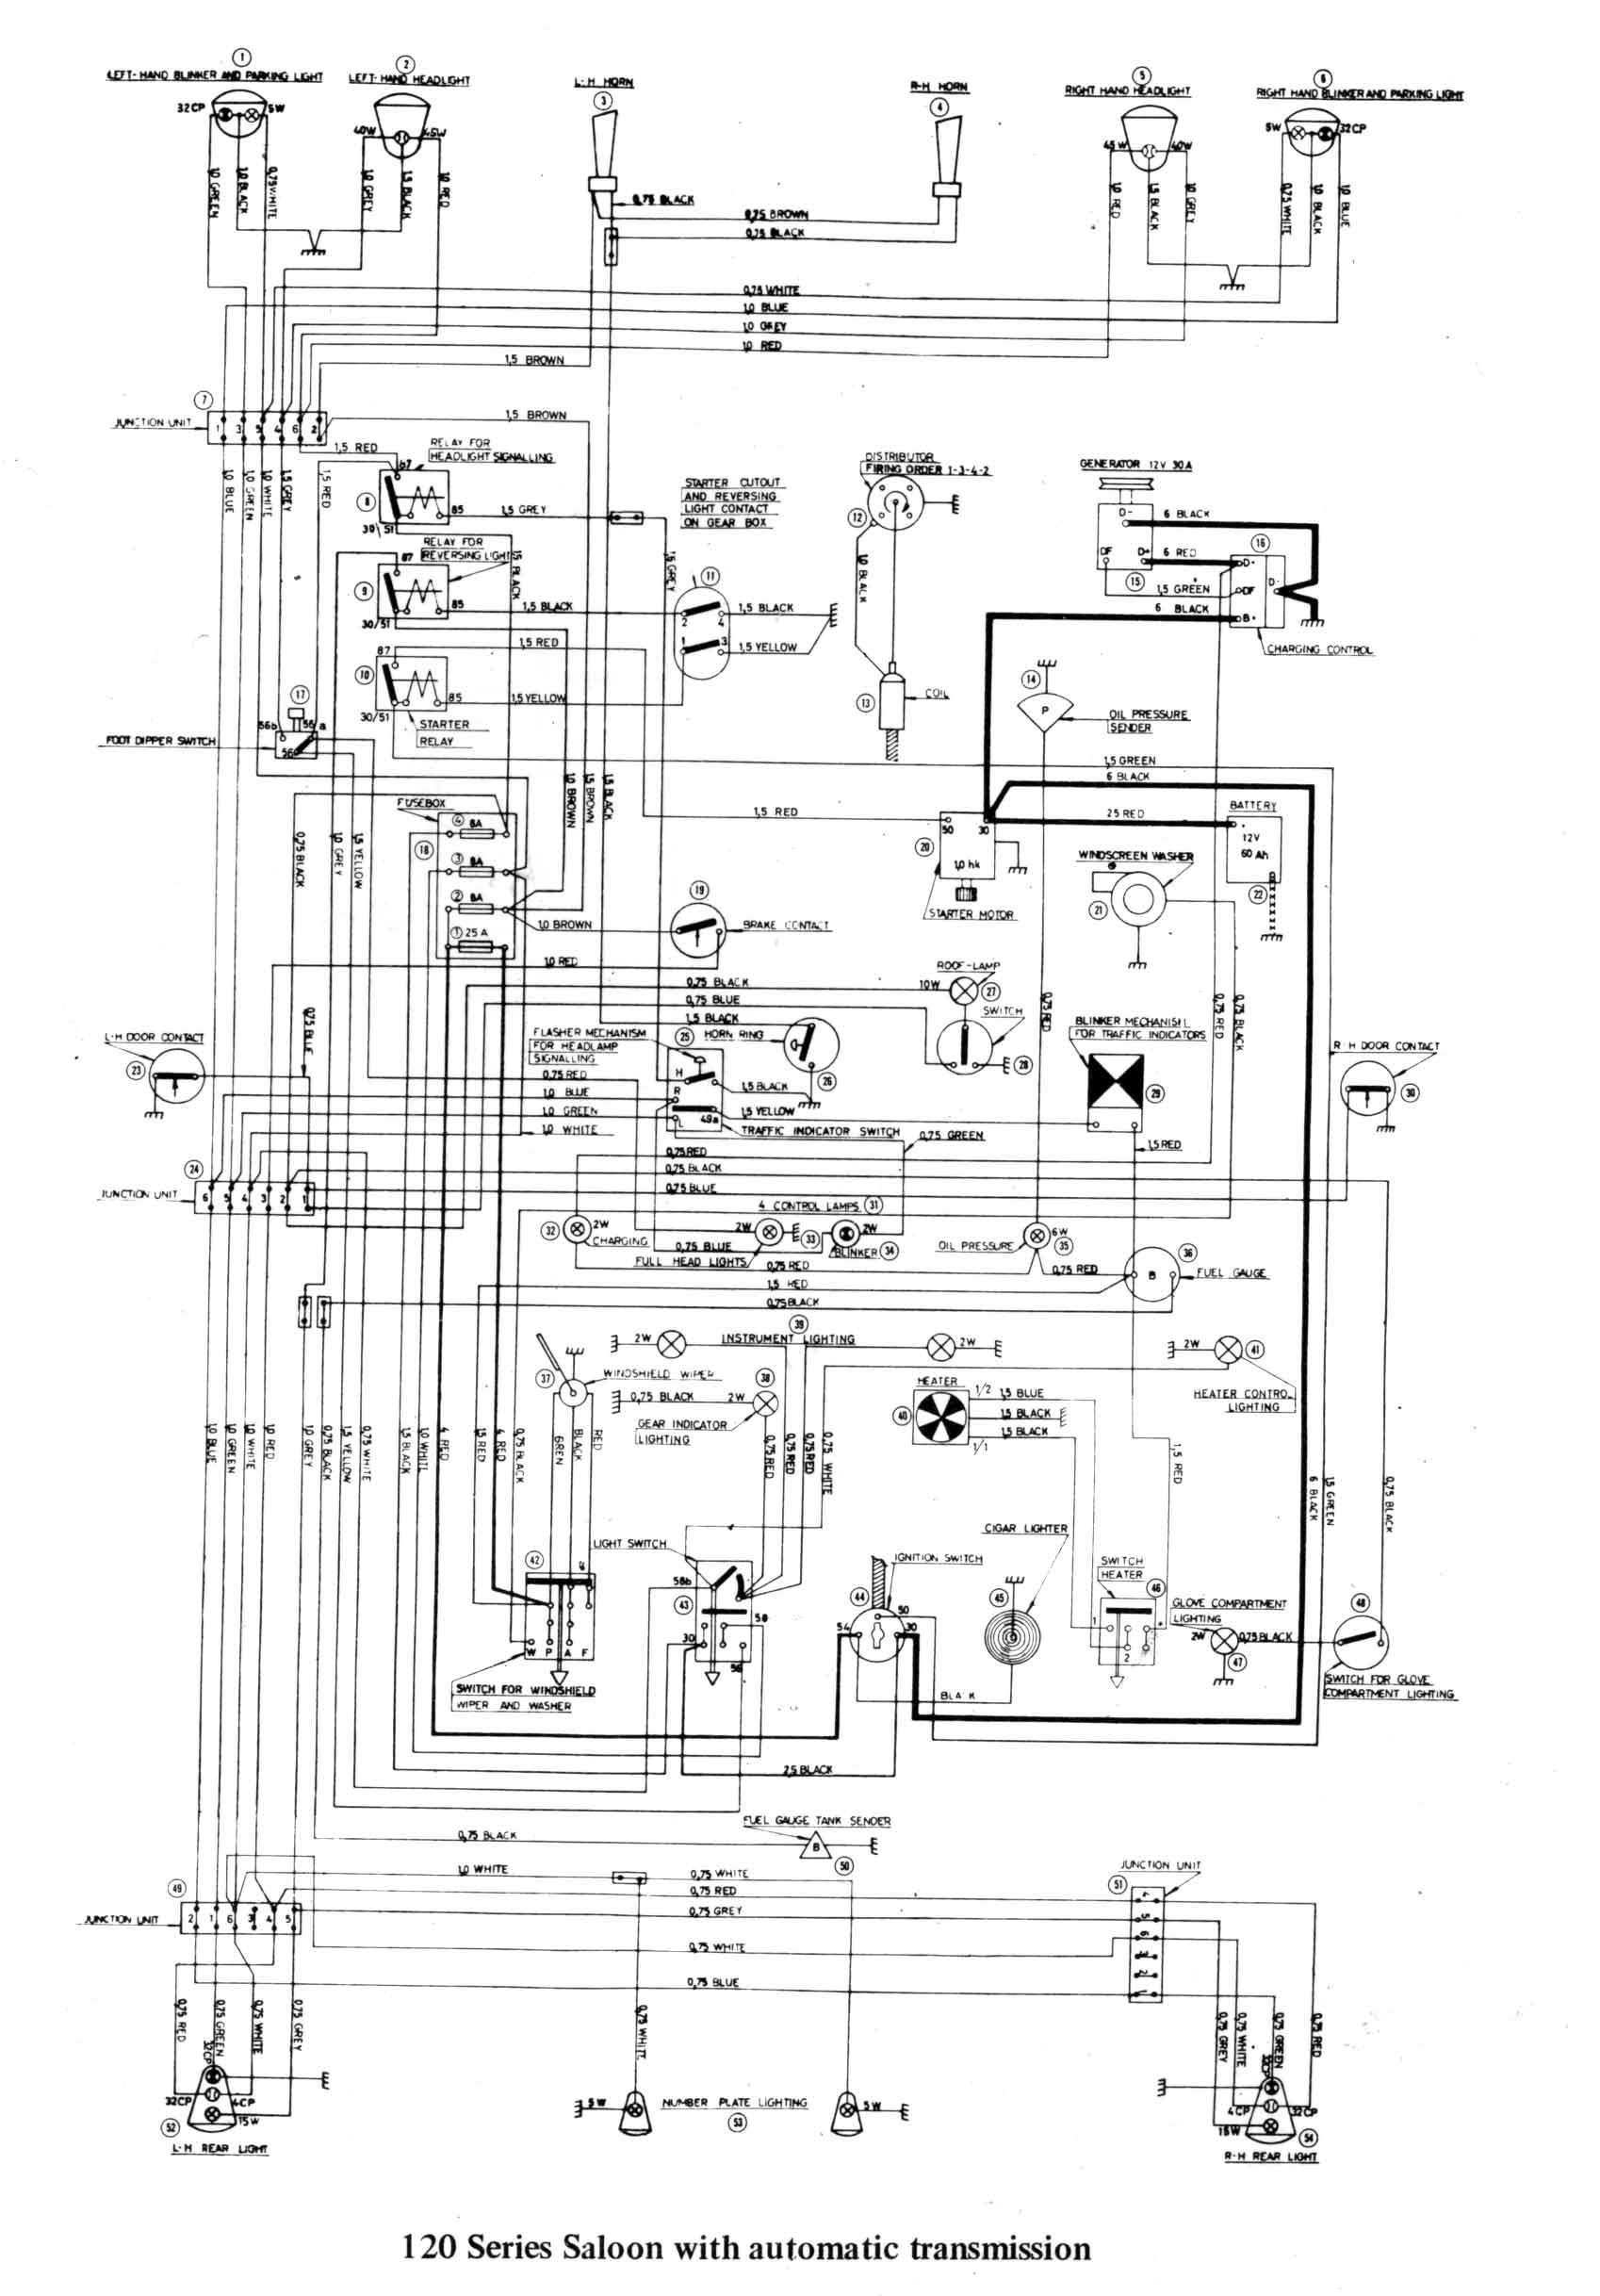 volvo wiring diagrams image details